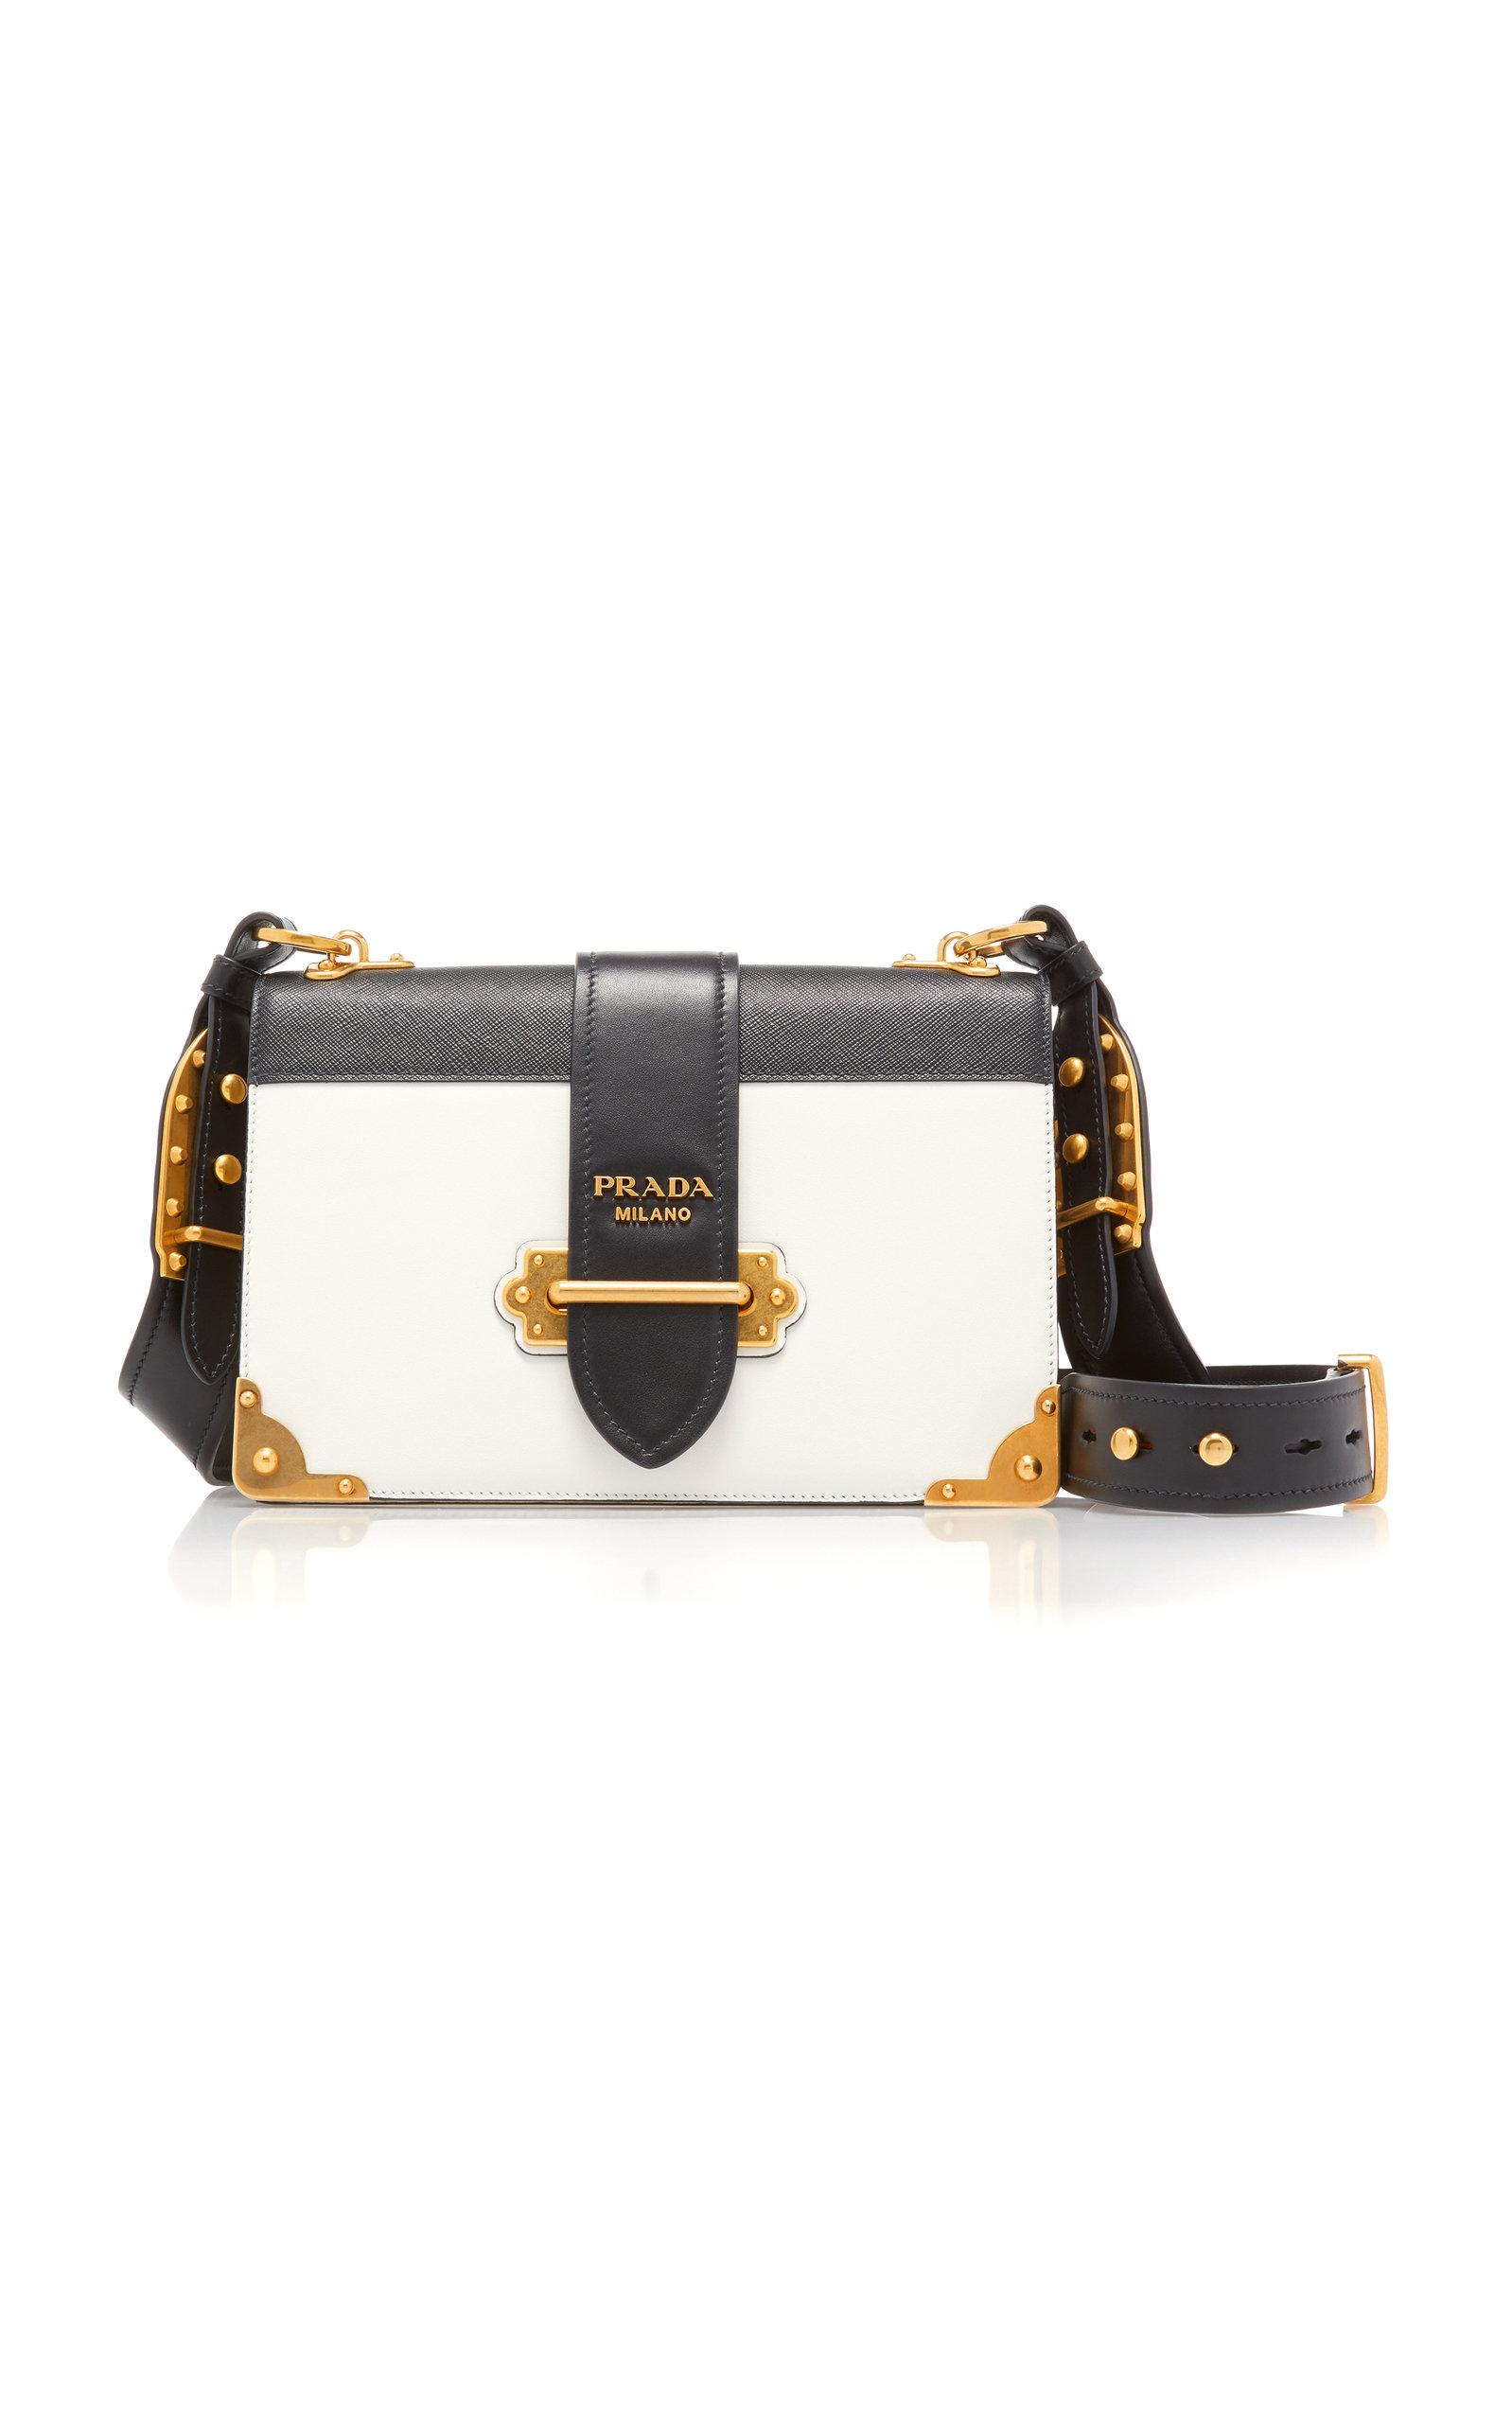 9495f219a47d Prada Cahier Large Two-Tone Leather Shoulder Bag   £2,820.00   Port